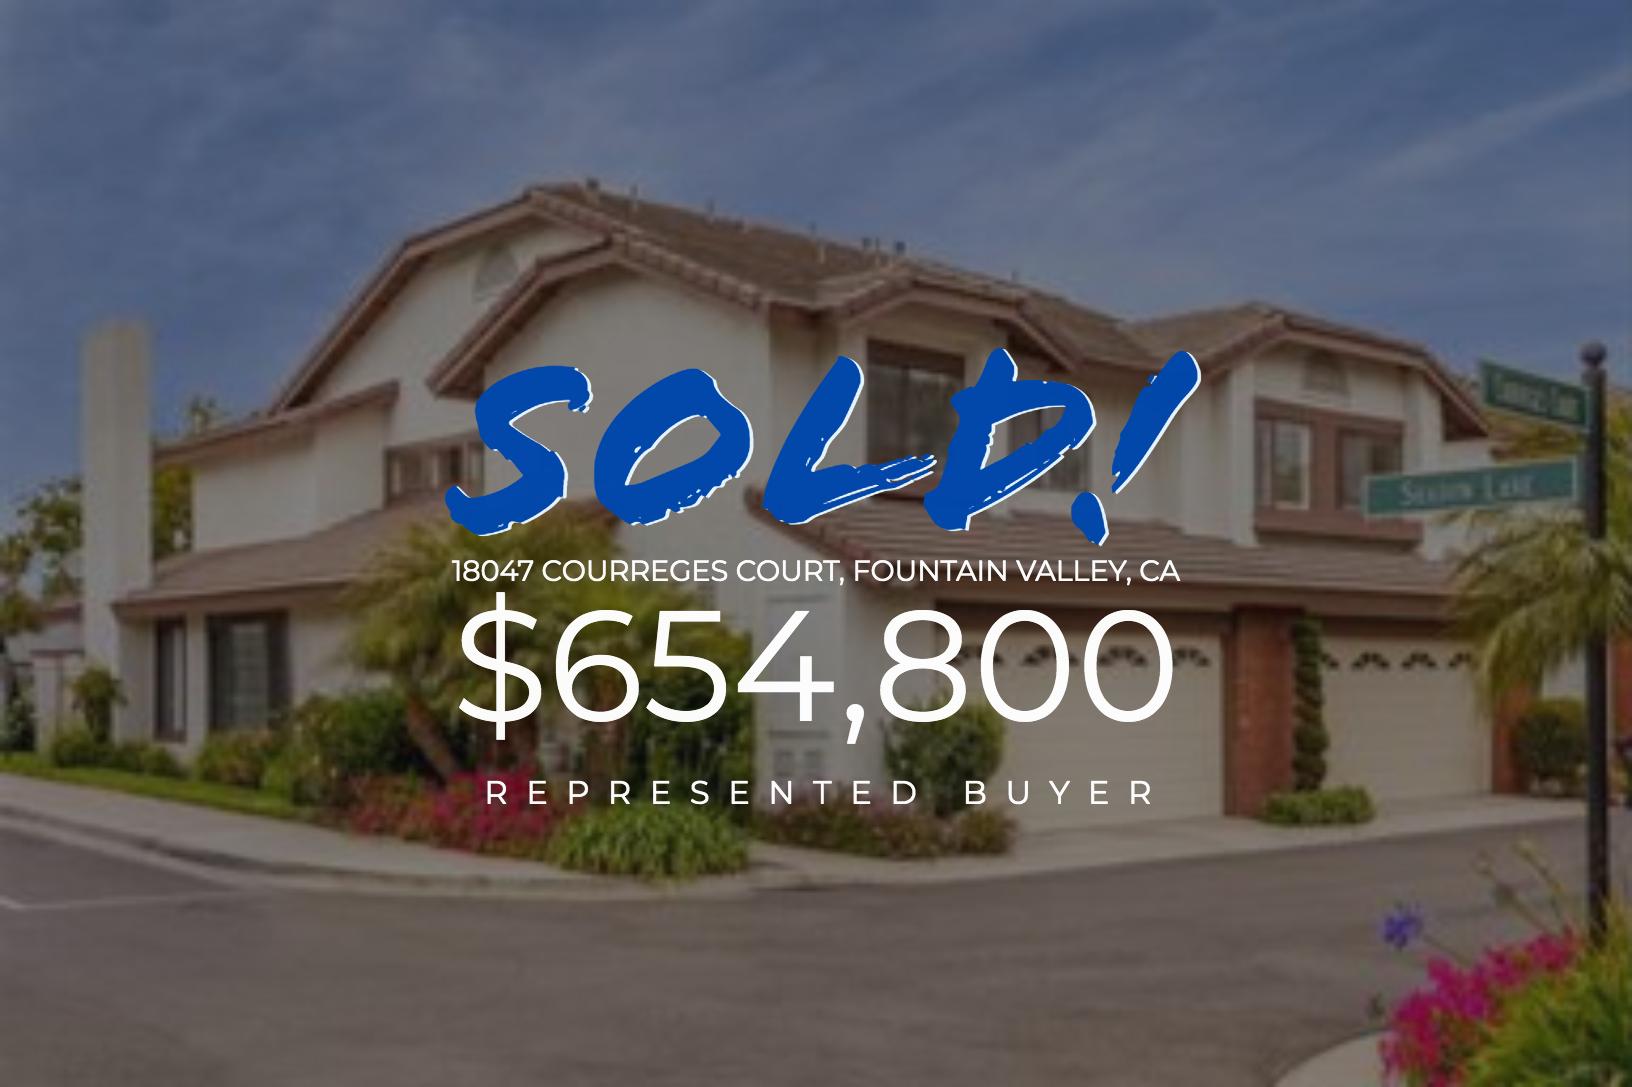 Sold With Matt Blashaw 180477\ Courreges Court in Fountain Valley, CA